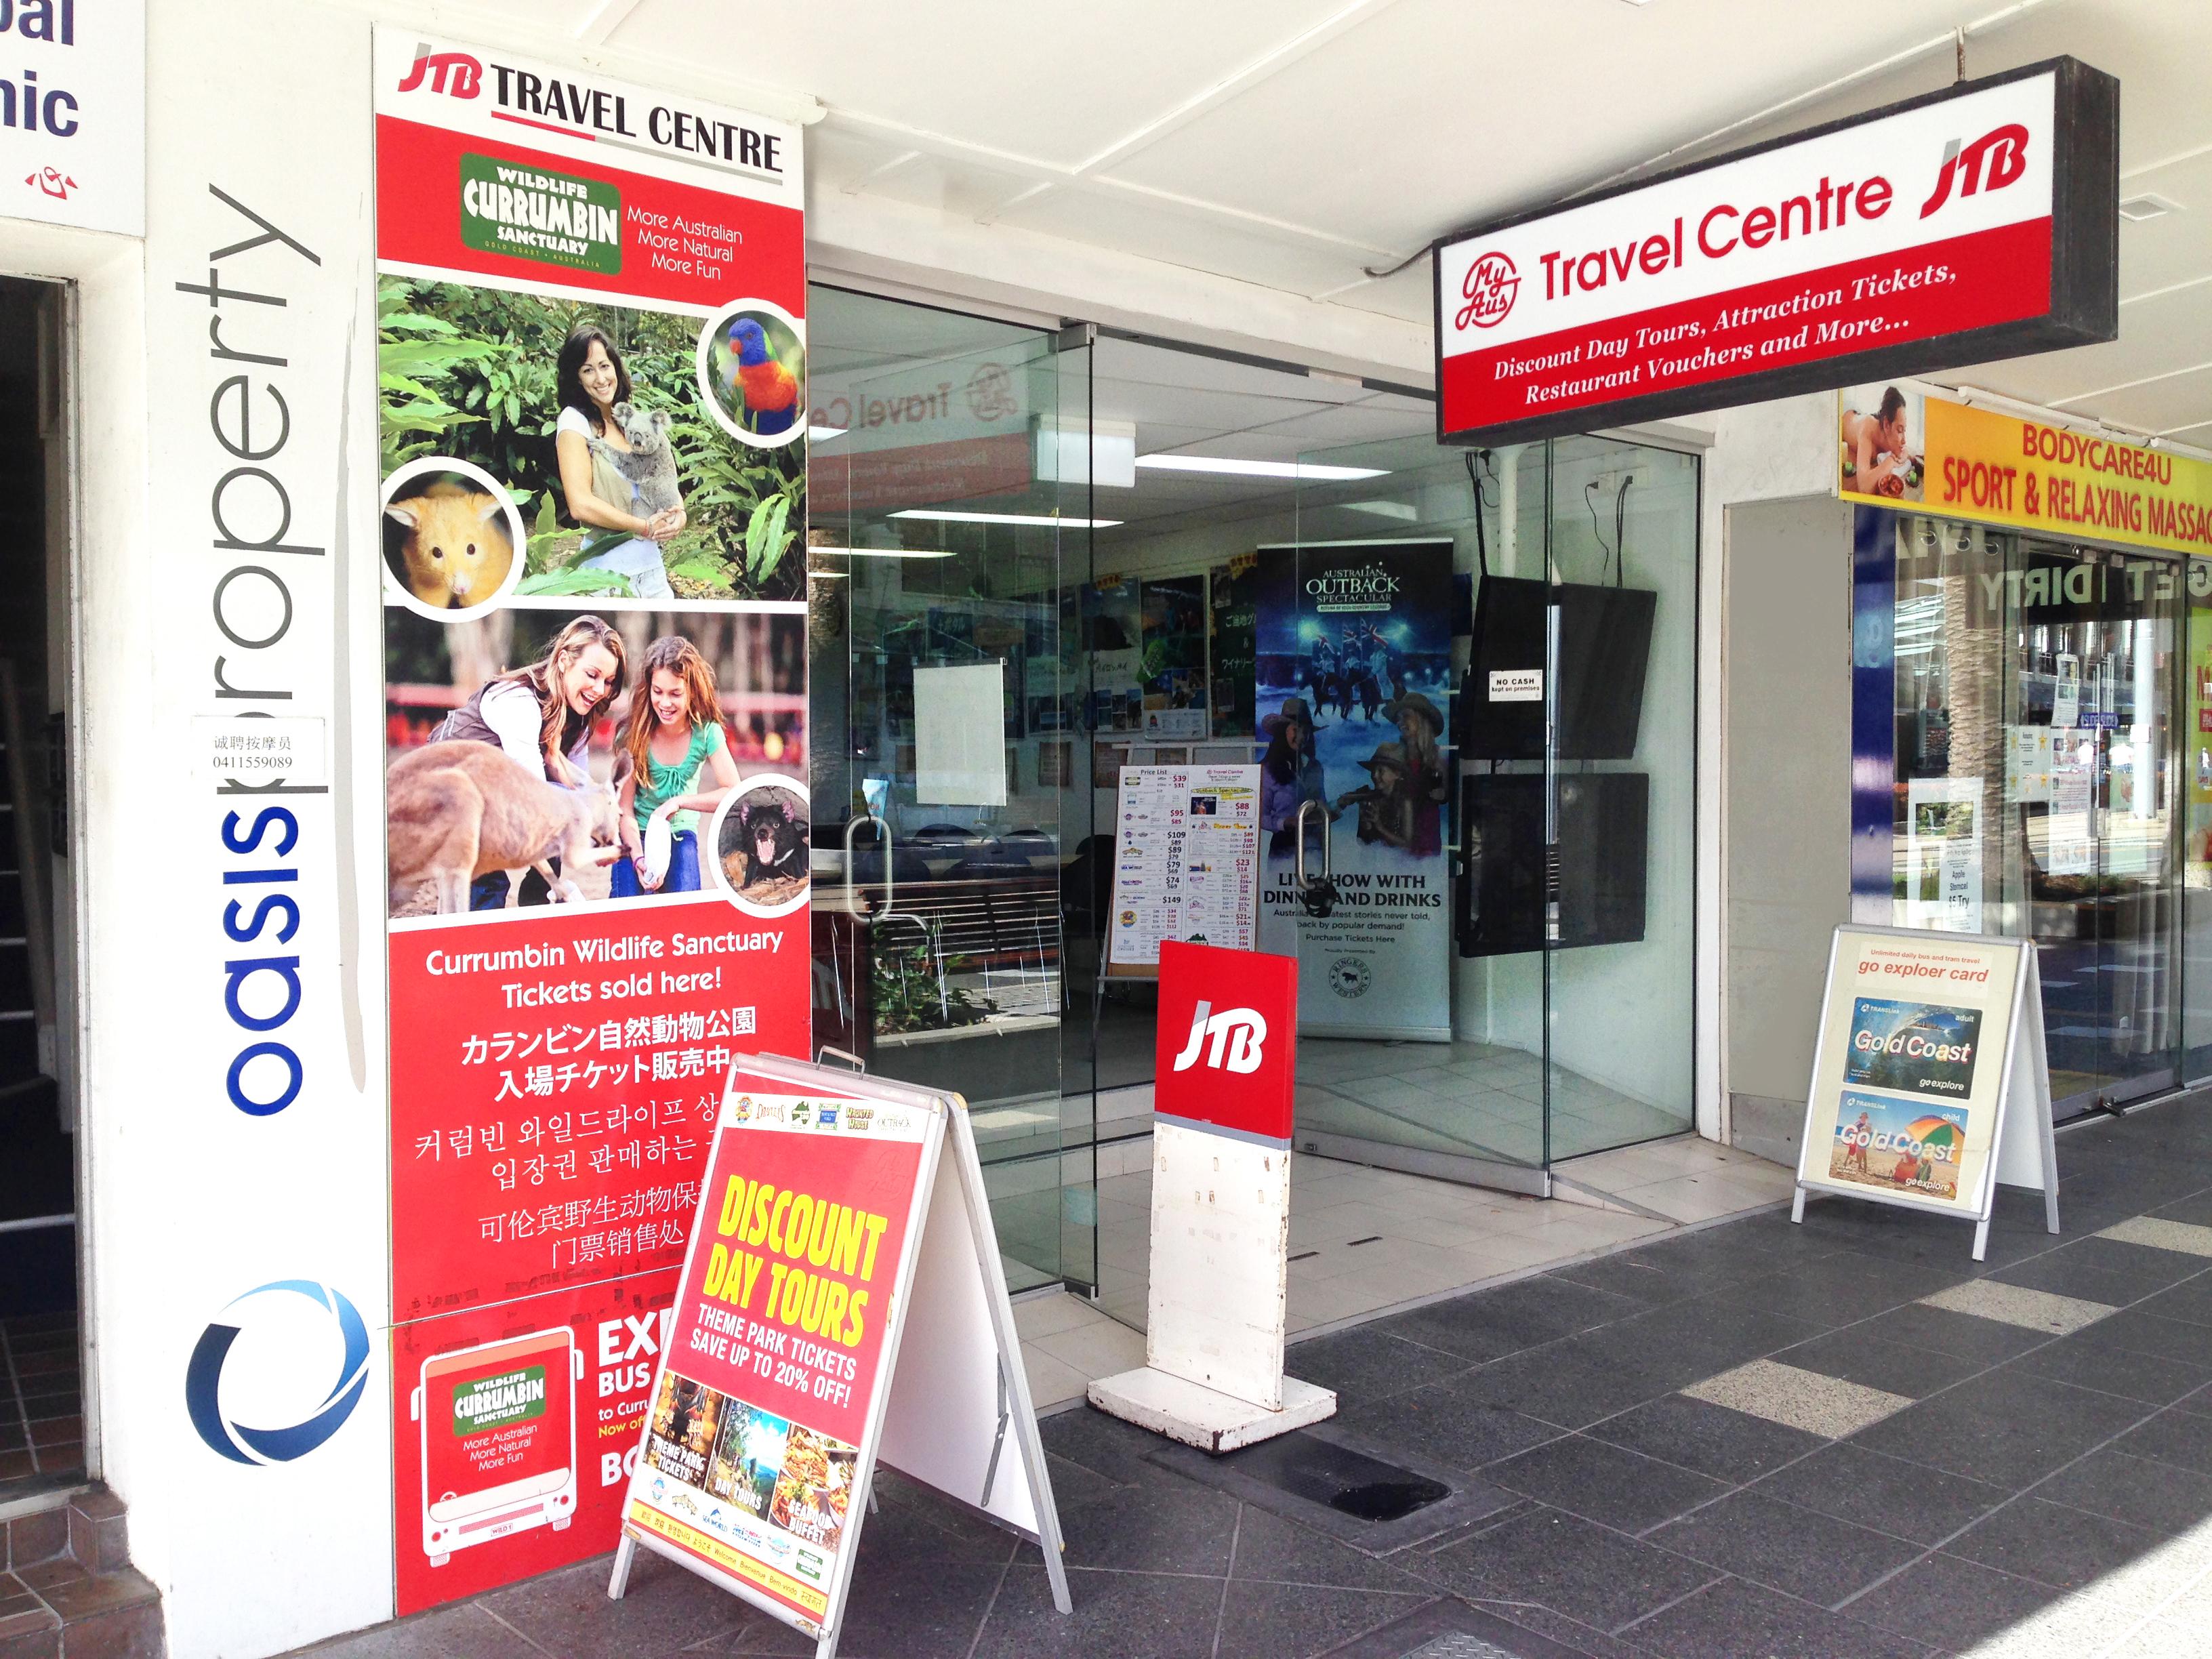 My Aus Travel Center JTB